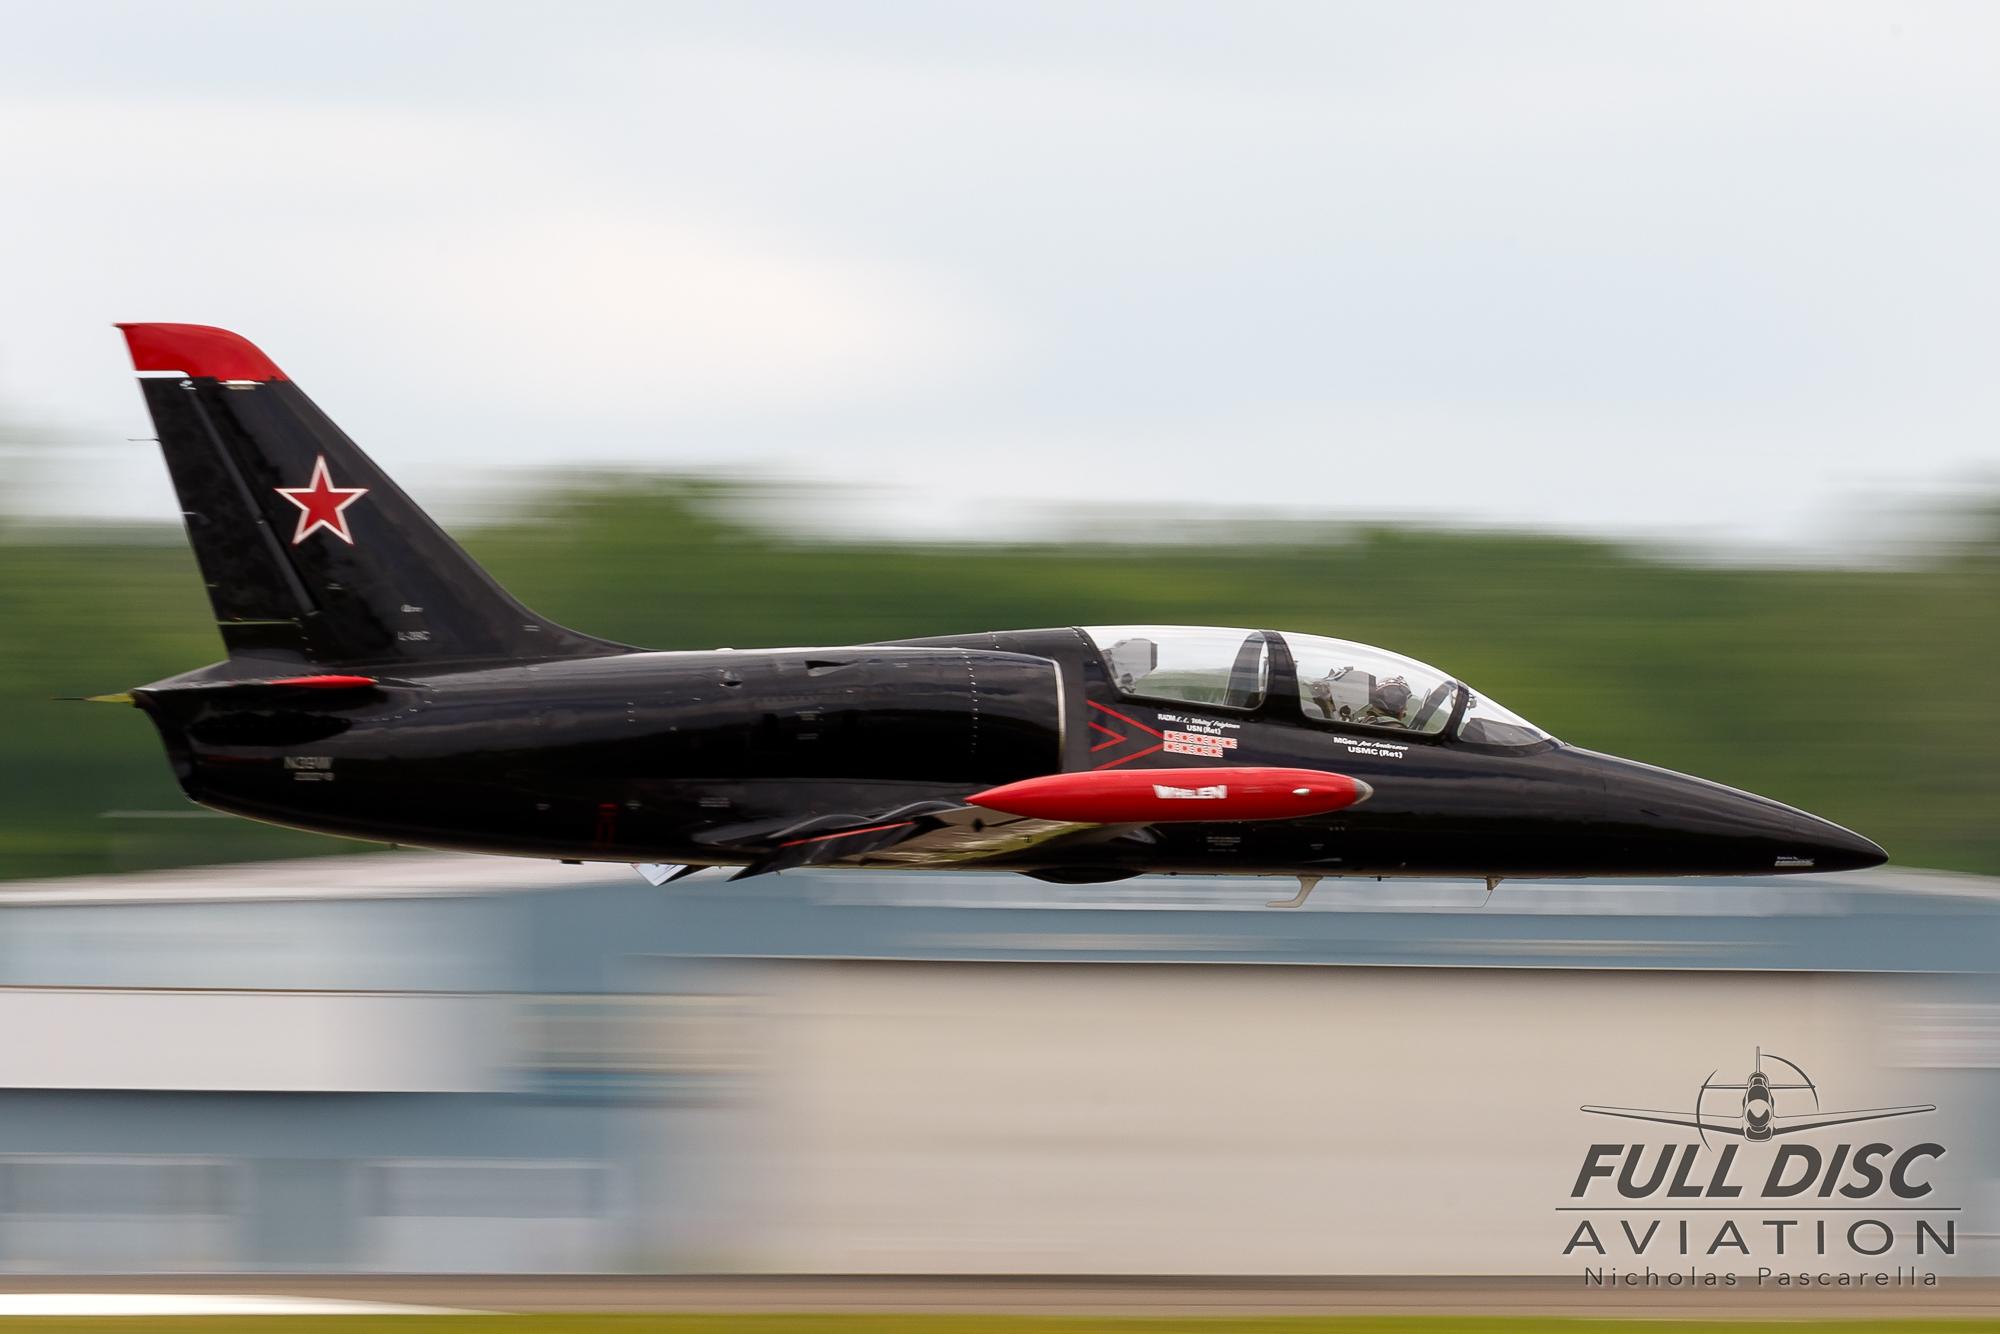 artnalls_l39_takeoff_nickpascarella_nicholaspascarella_fulldiscaviation_manassasairshow.jpg